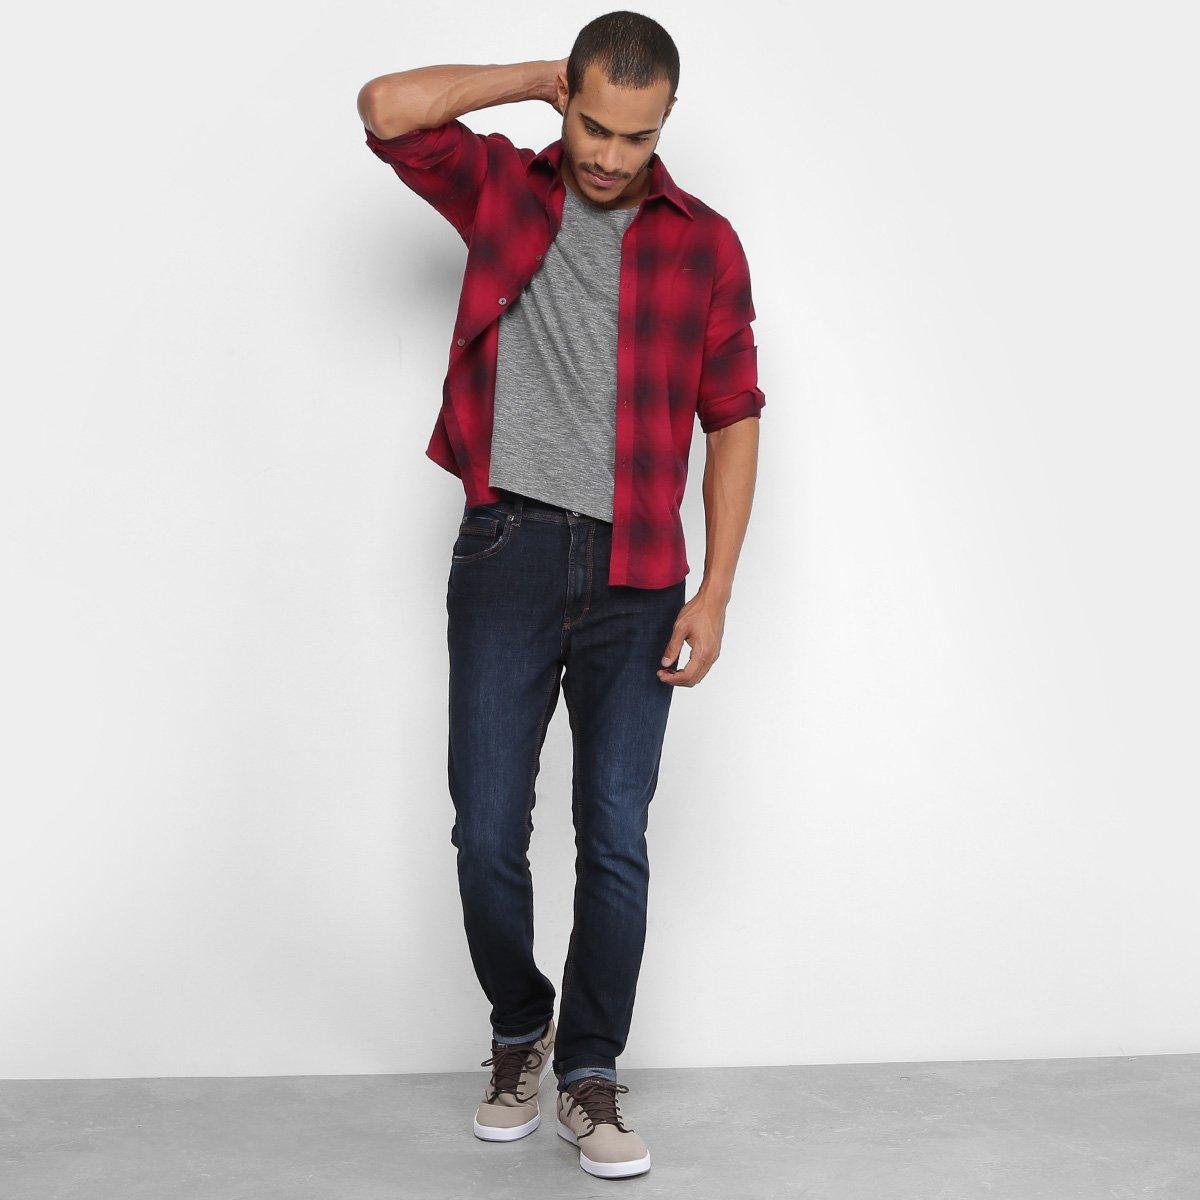 Calça Jeans MCD Denim New Slim West Masculina  3fdee03c5ae